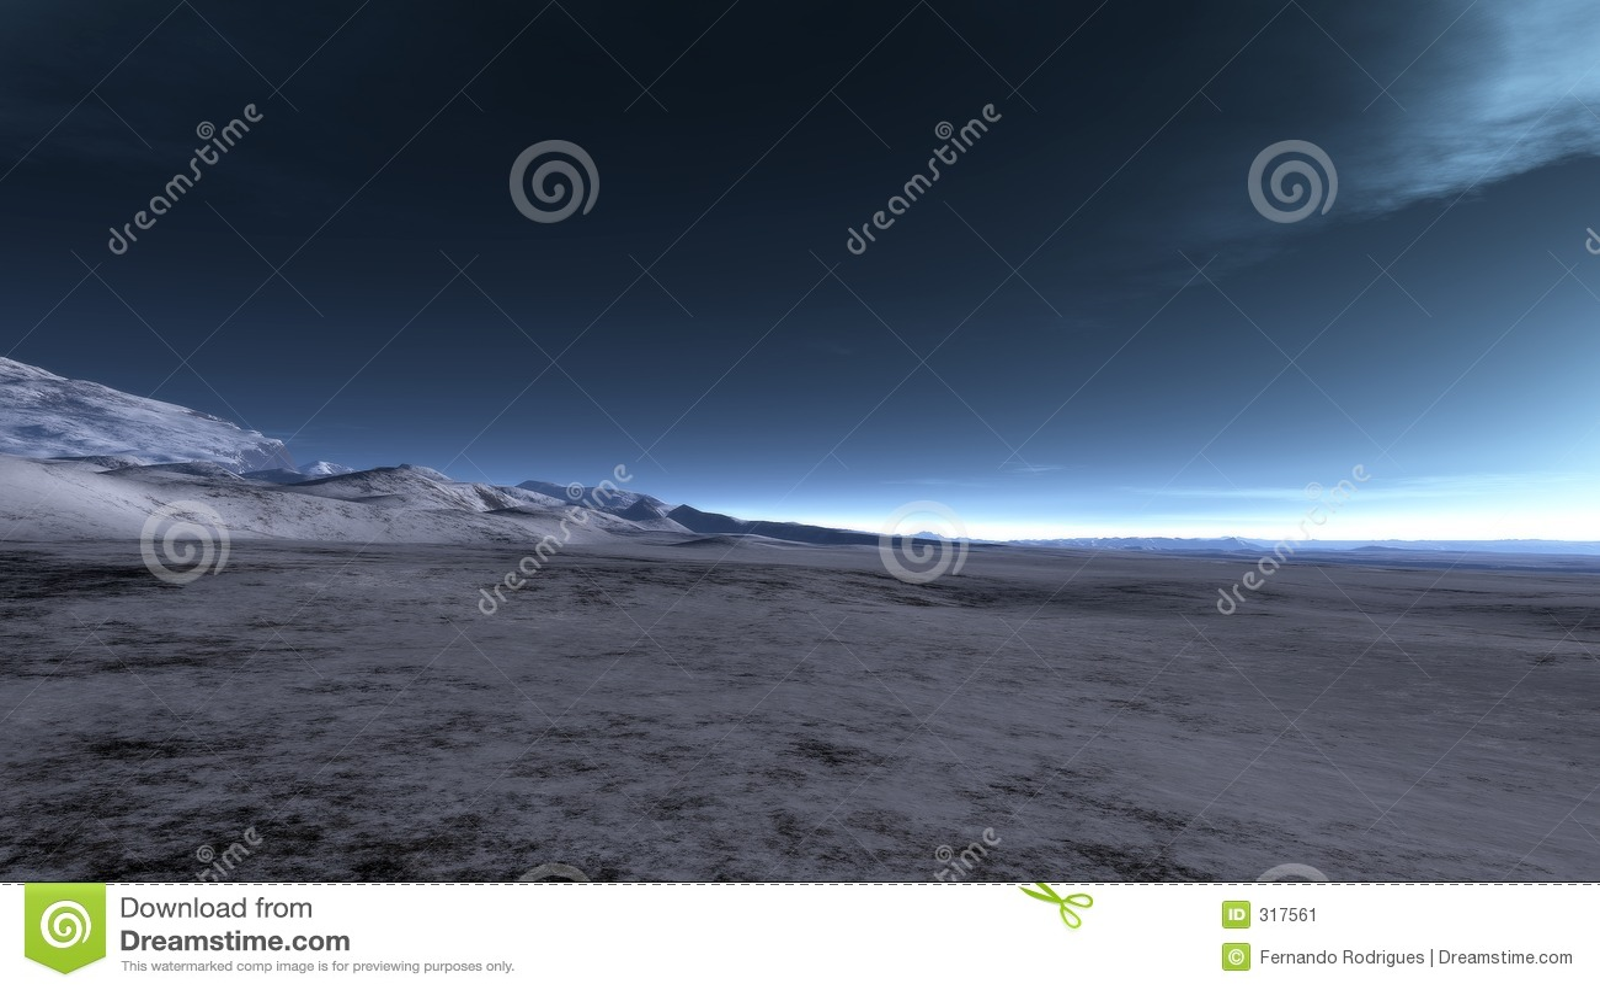 Digital view